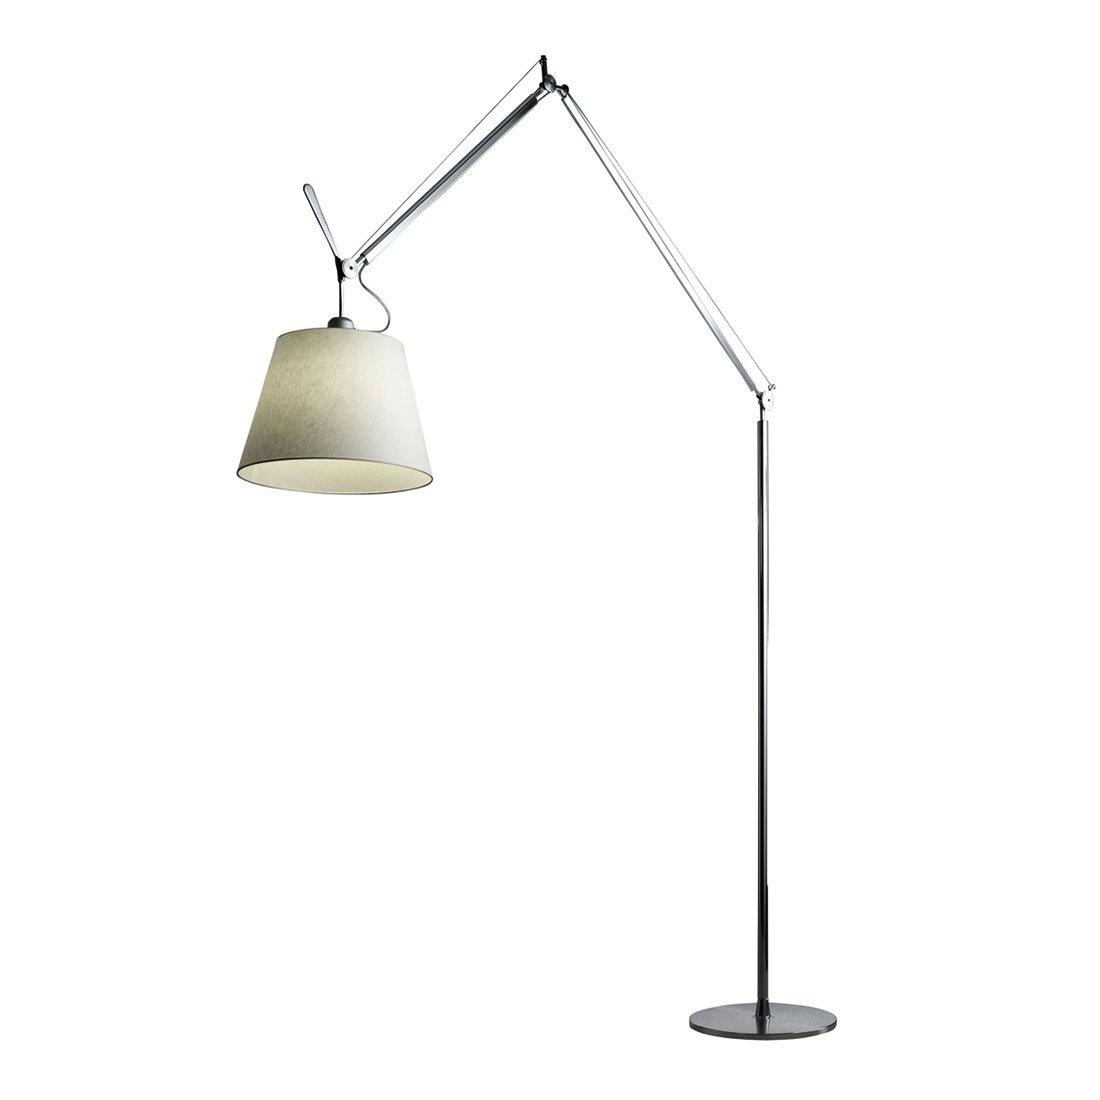 Tolomeo Mega Vloerlamp - Artemide